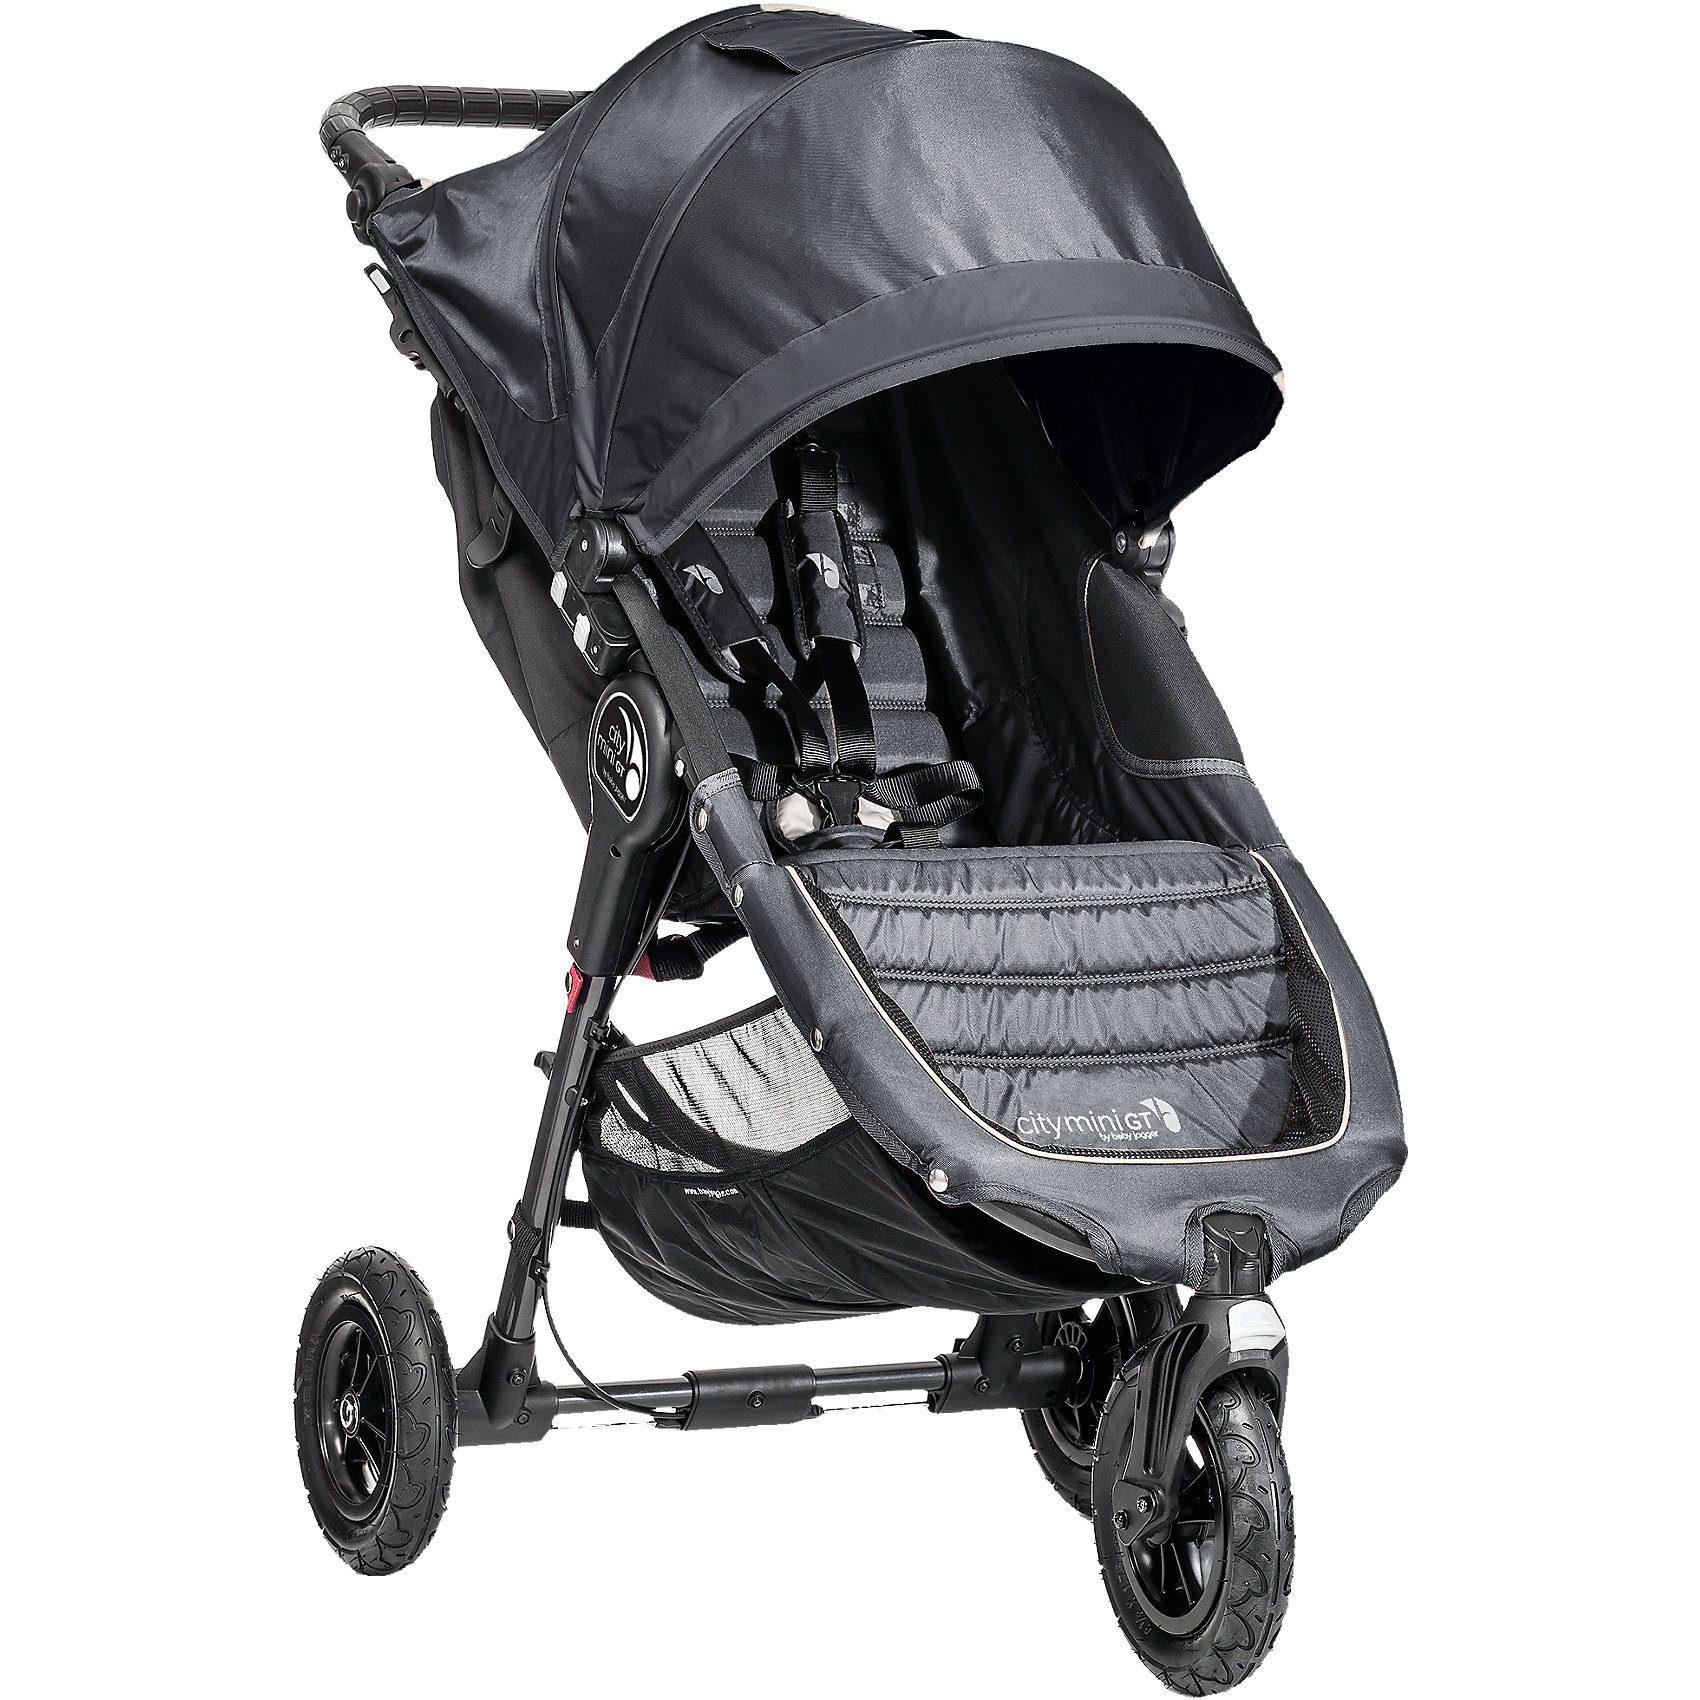 Baby Jogger Jogger City Mini GT, black denim, Sonderedition, 2016